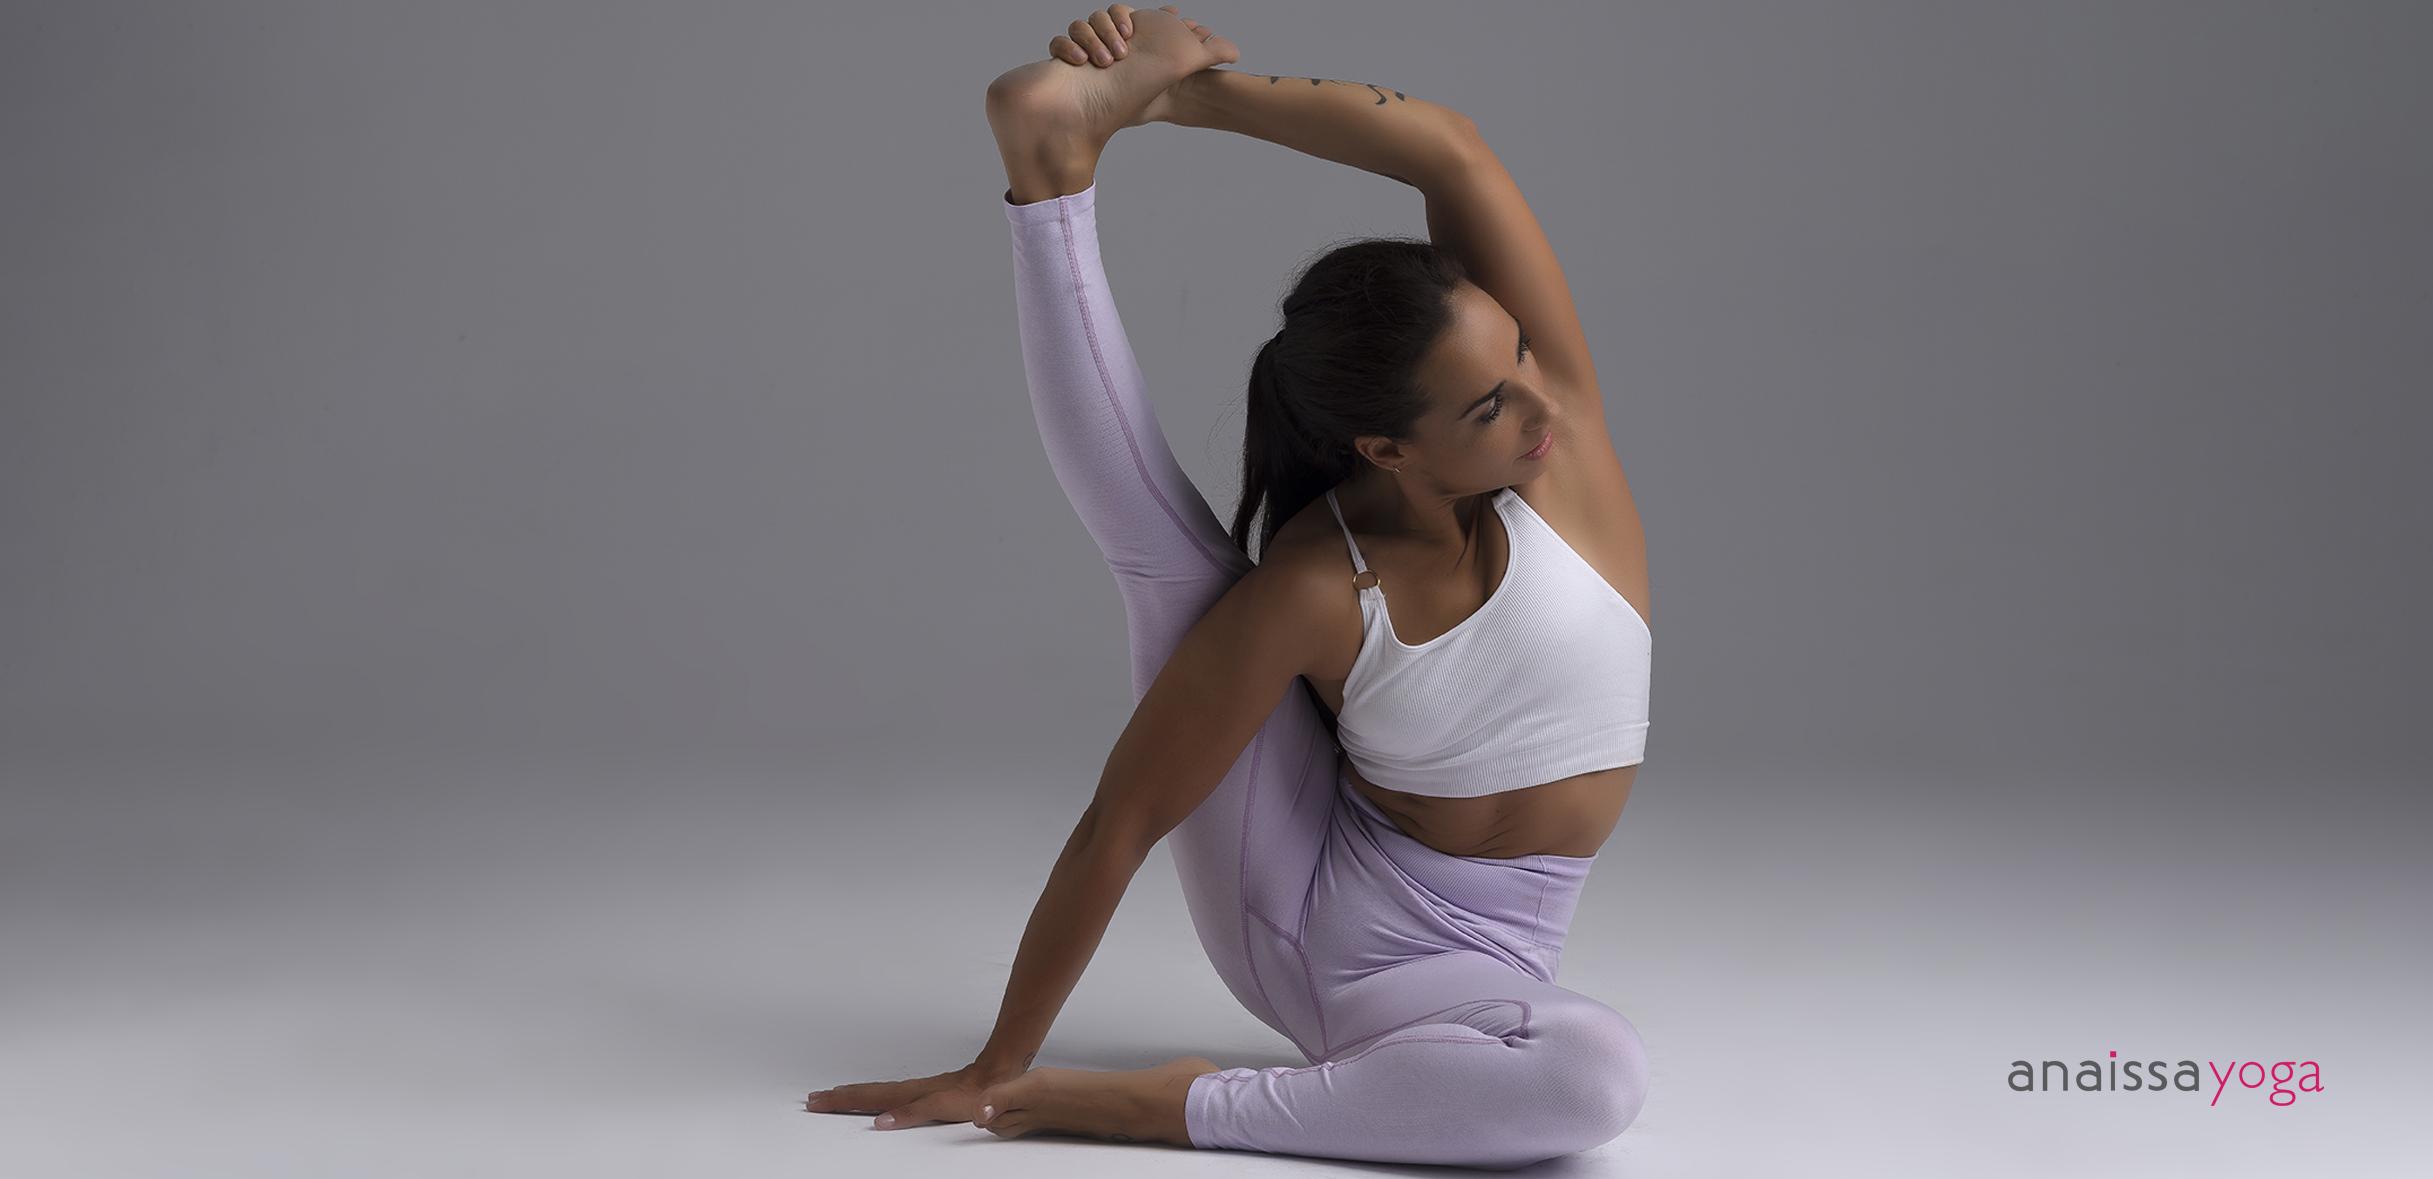 practicar yoga Anaissa Yoga